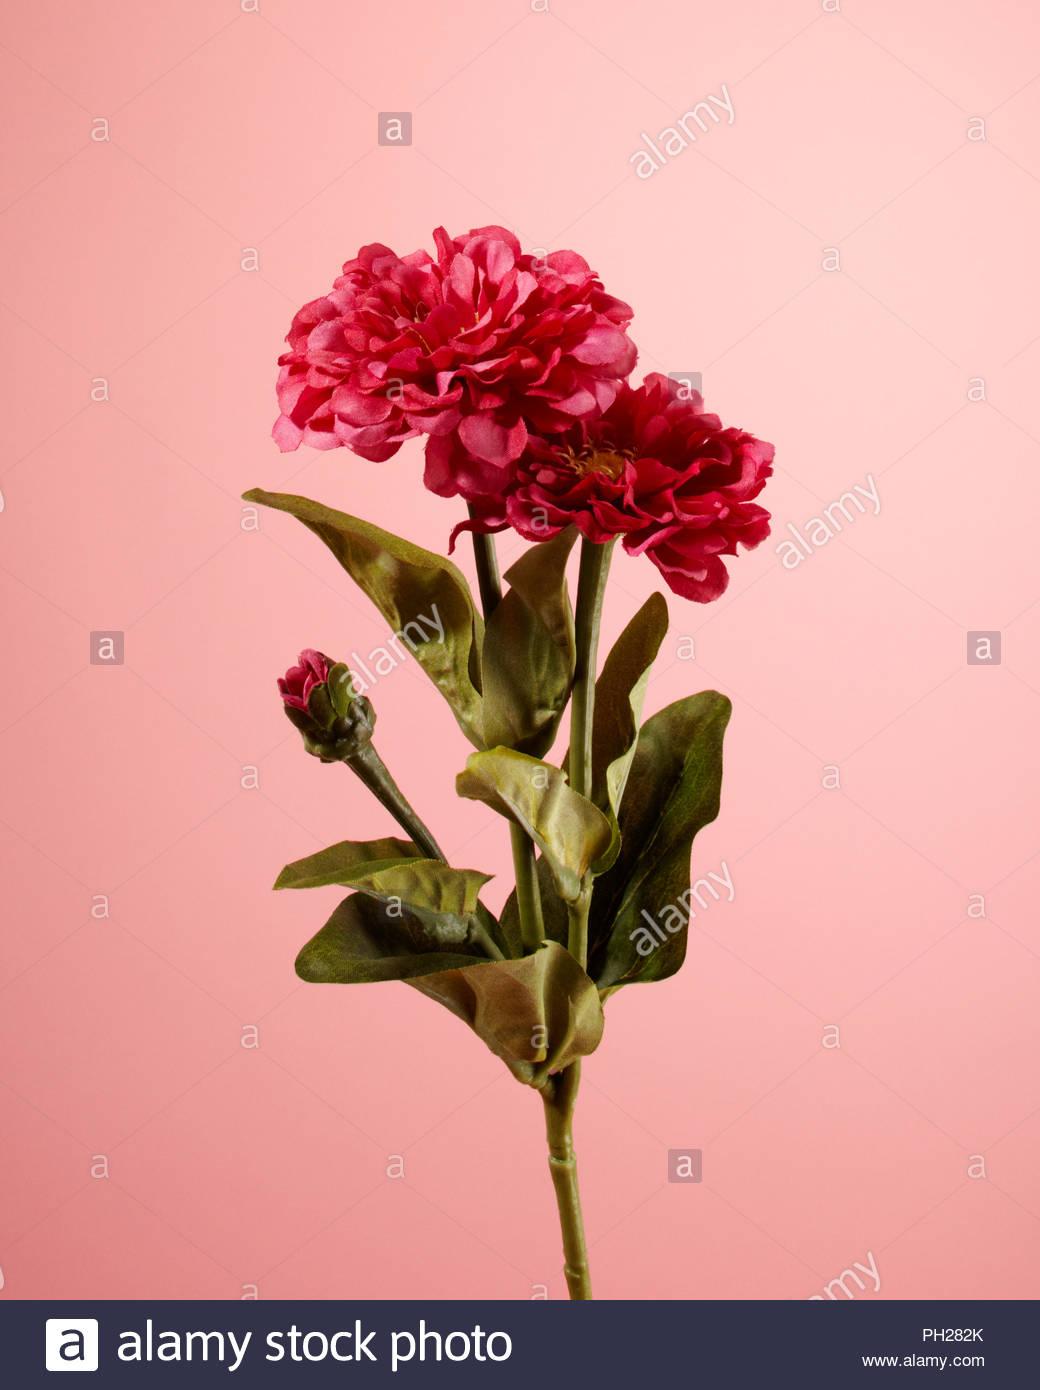 Pink flower - Stock Image